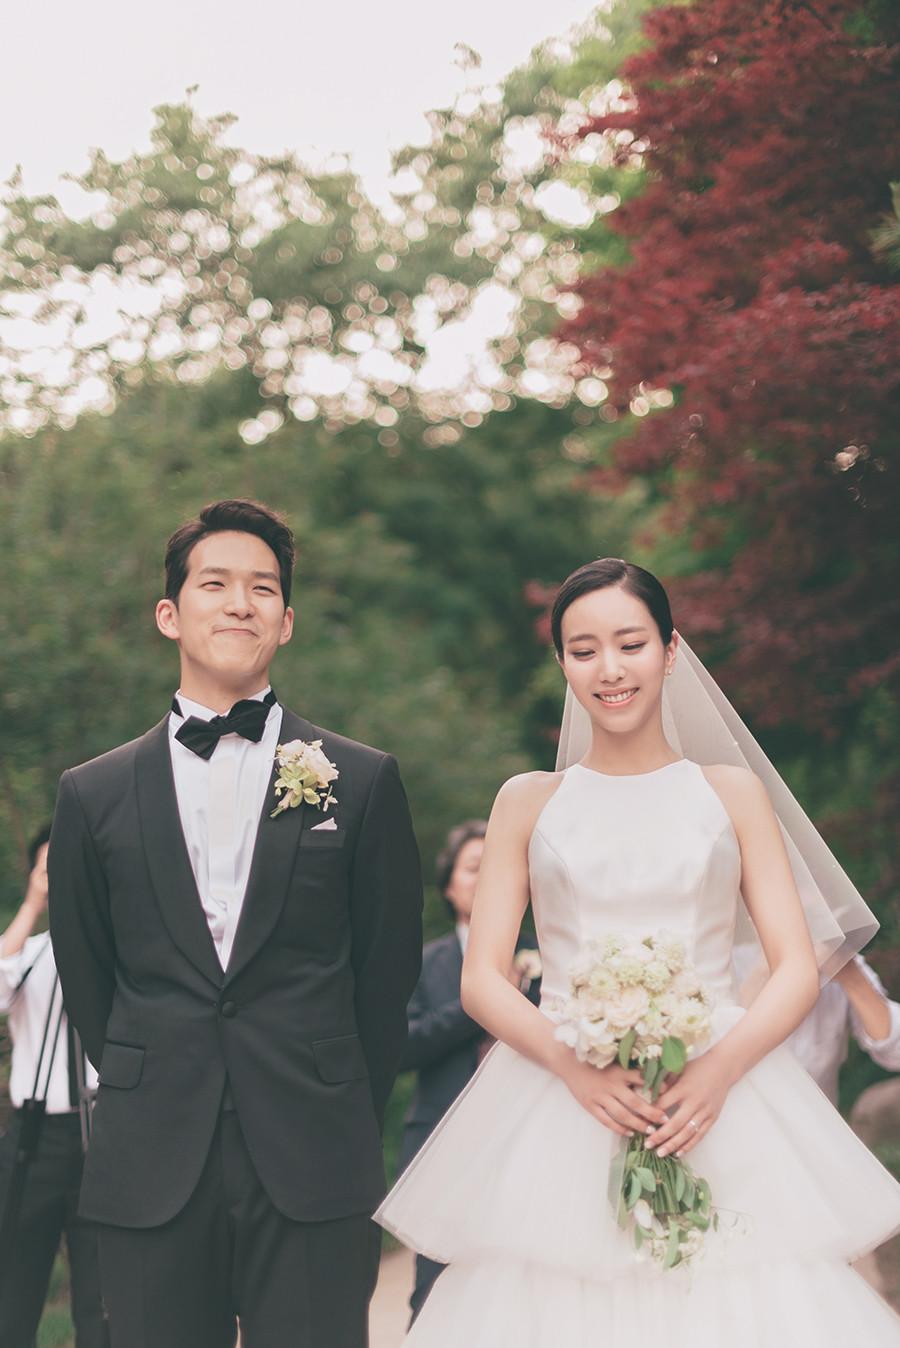 BK & Chan's Wedding Ⅱ - Seoul Museum, Korea